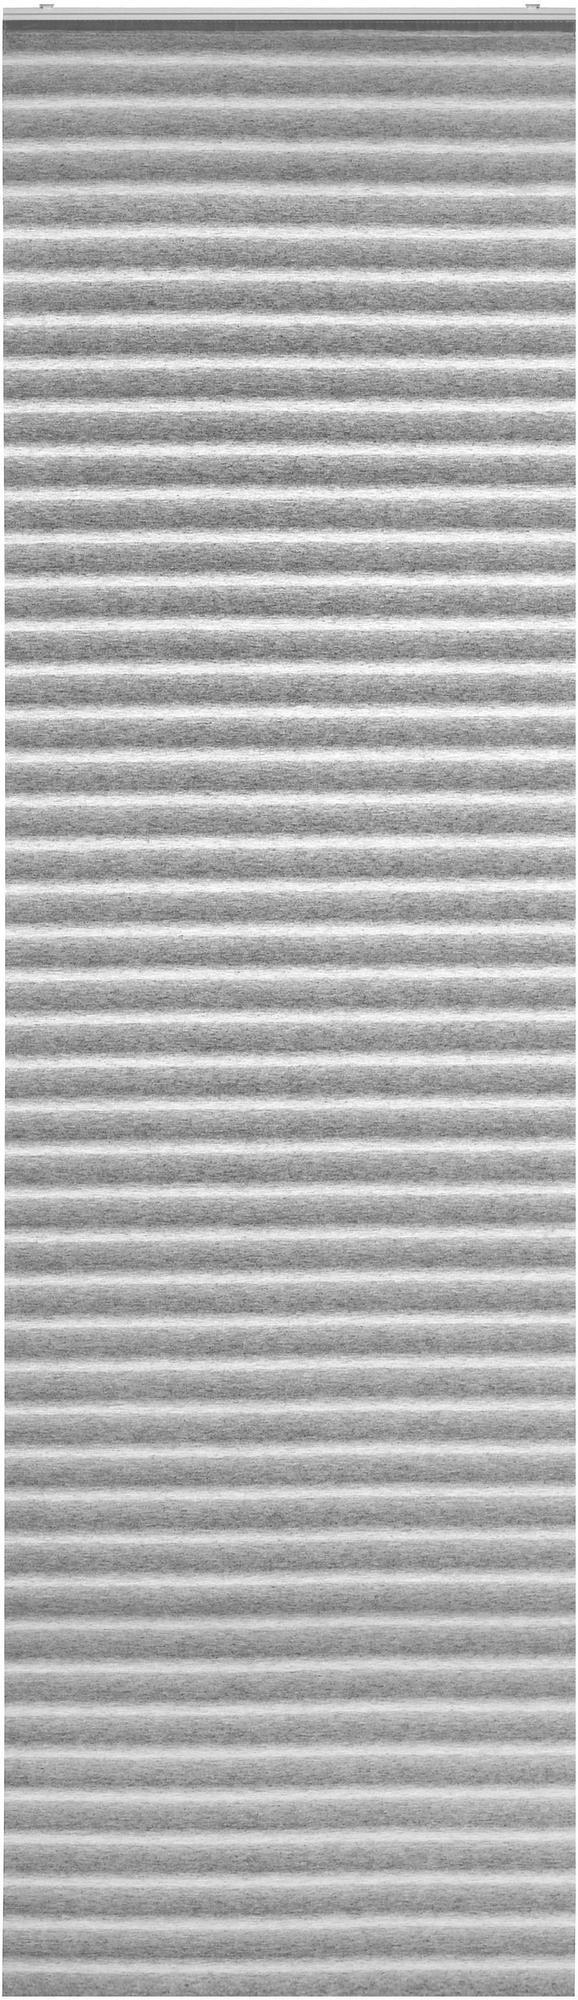 Flächenvorhang Flow Grau 60x245cm - Grau, MODERN, Textil (60/245cm) - Mömax modern living